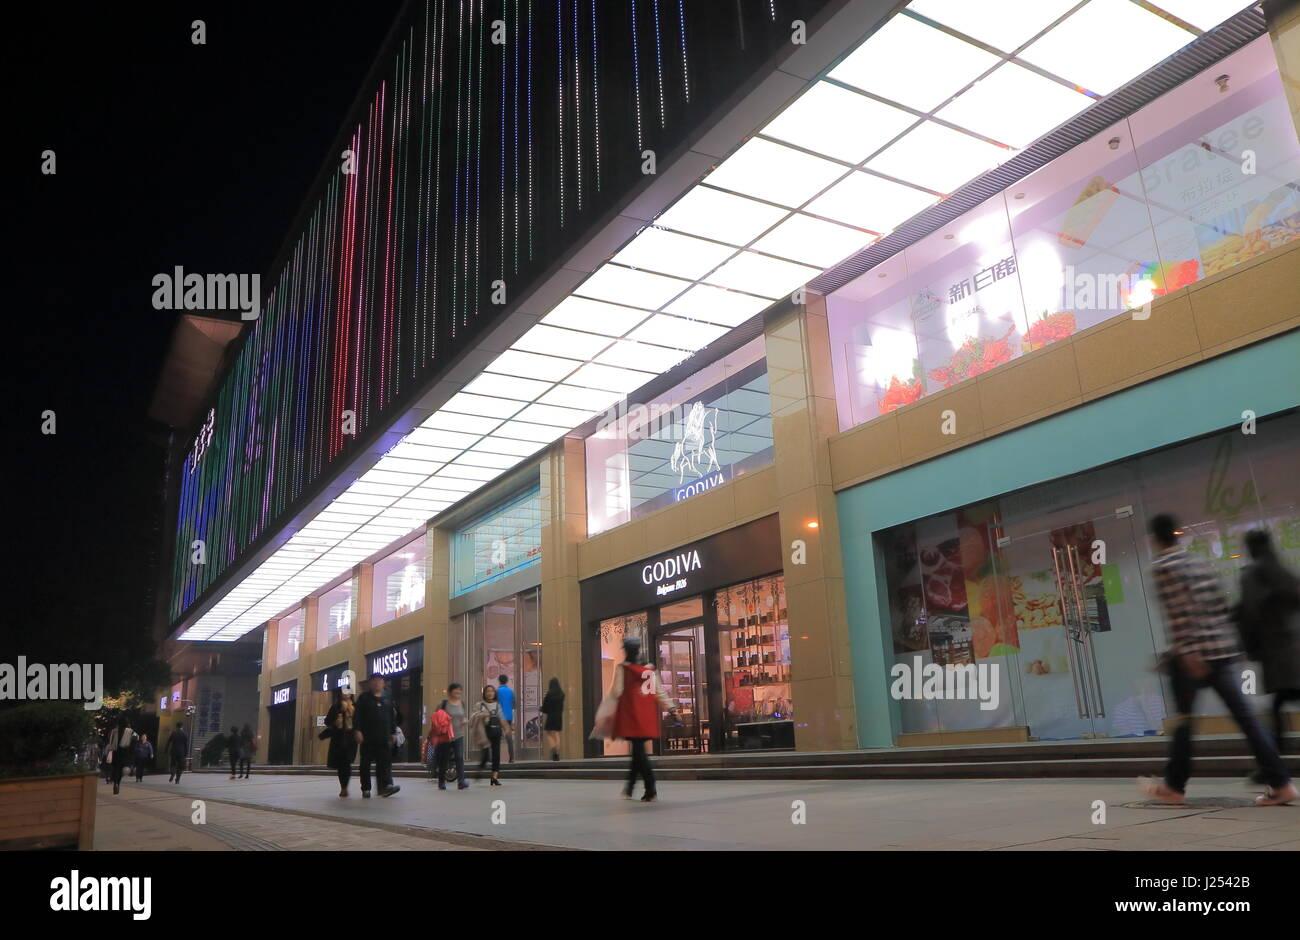 d62da925d211e8 People visit Baixin Yuan China Shopping Mall in Hangzhou China. Baixin Yuan China  Shopping Mall